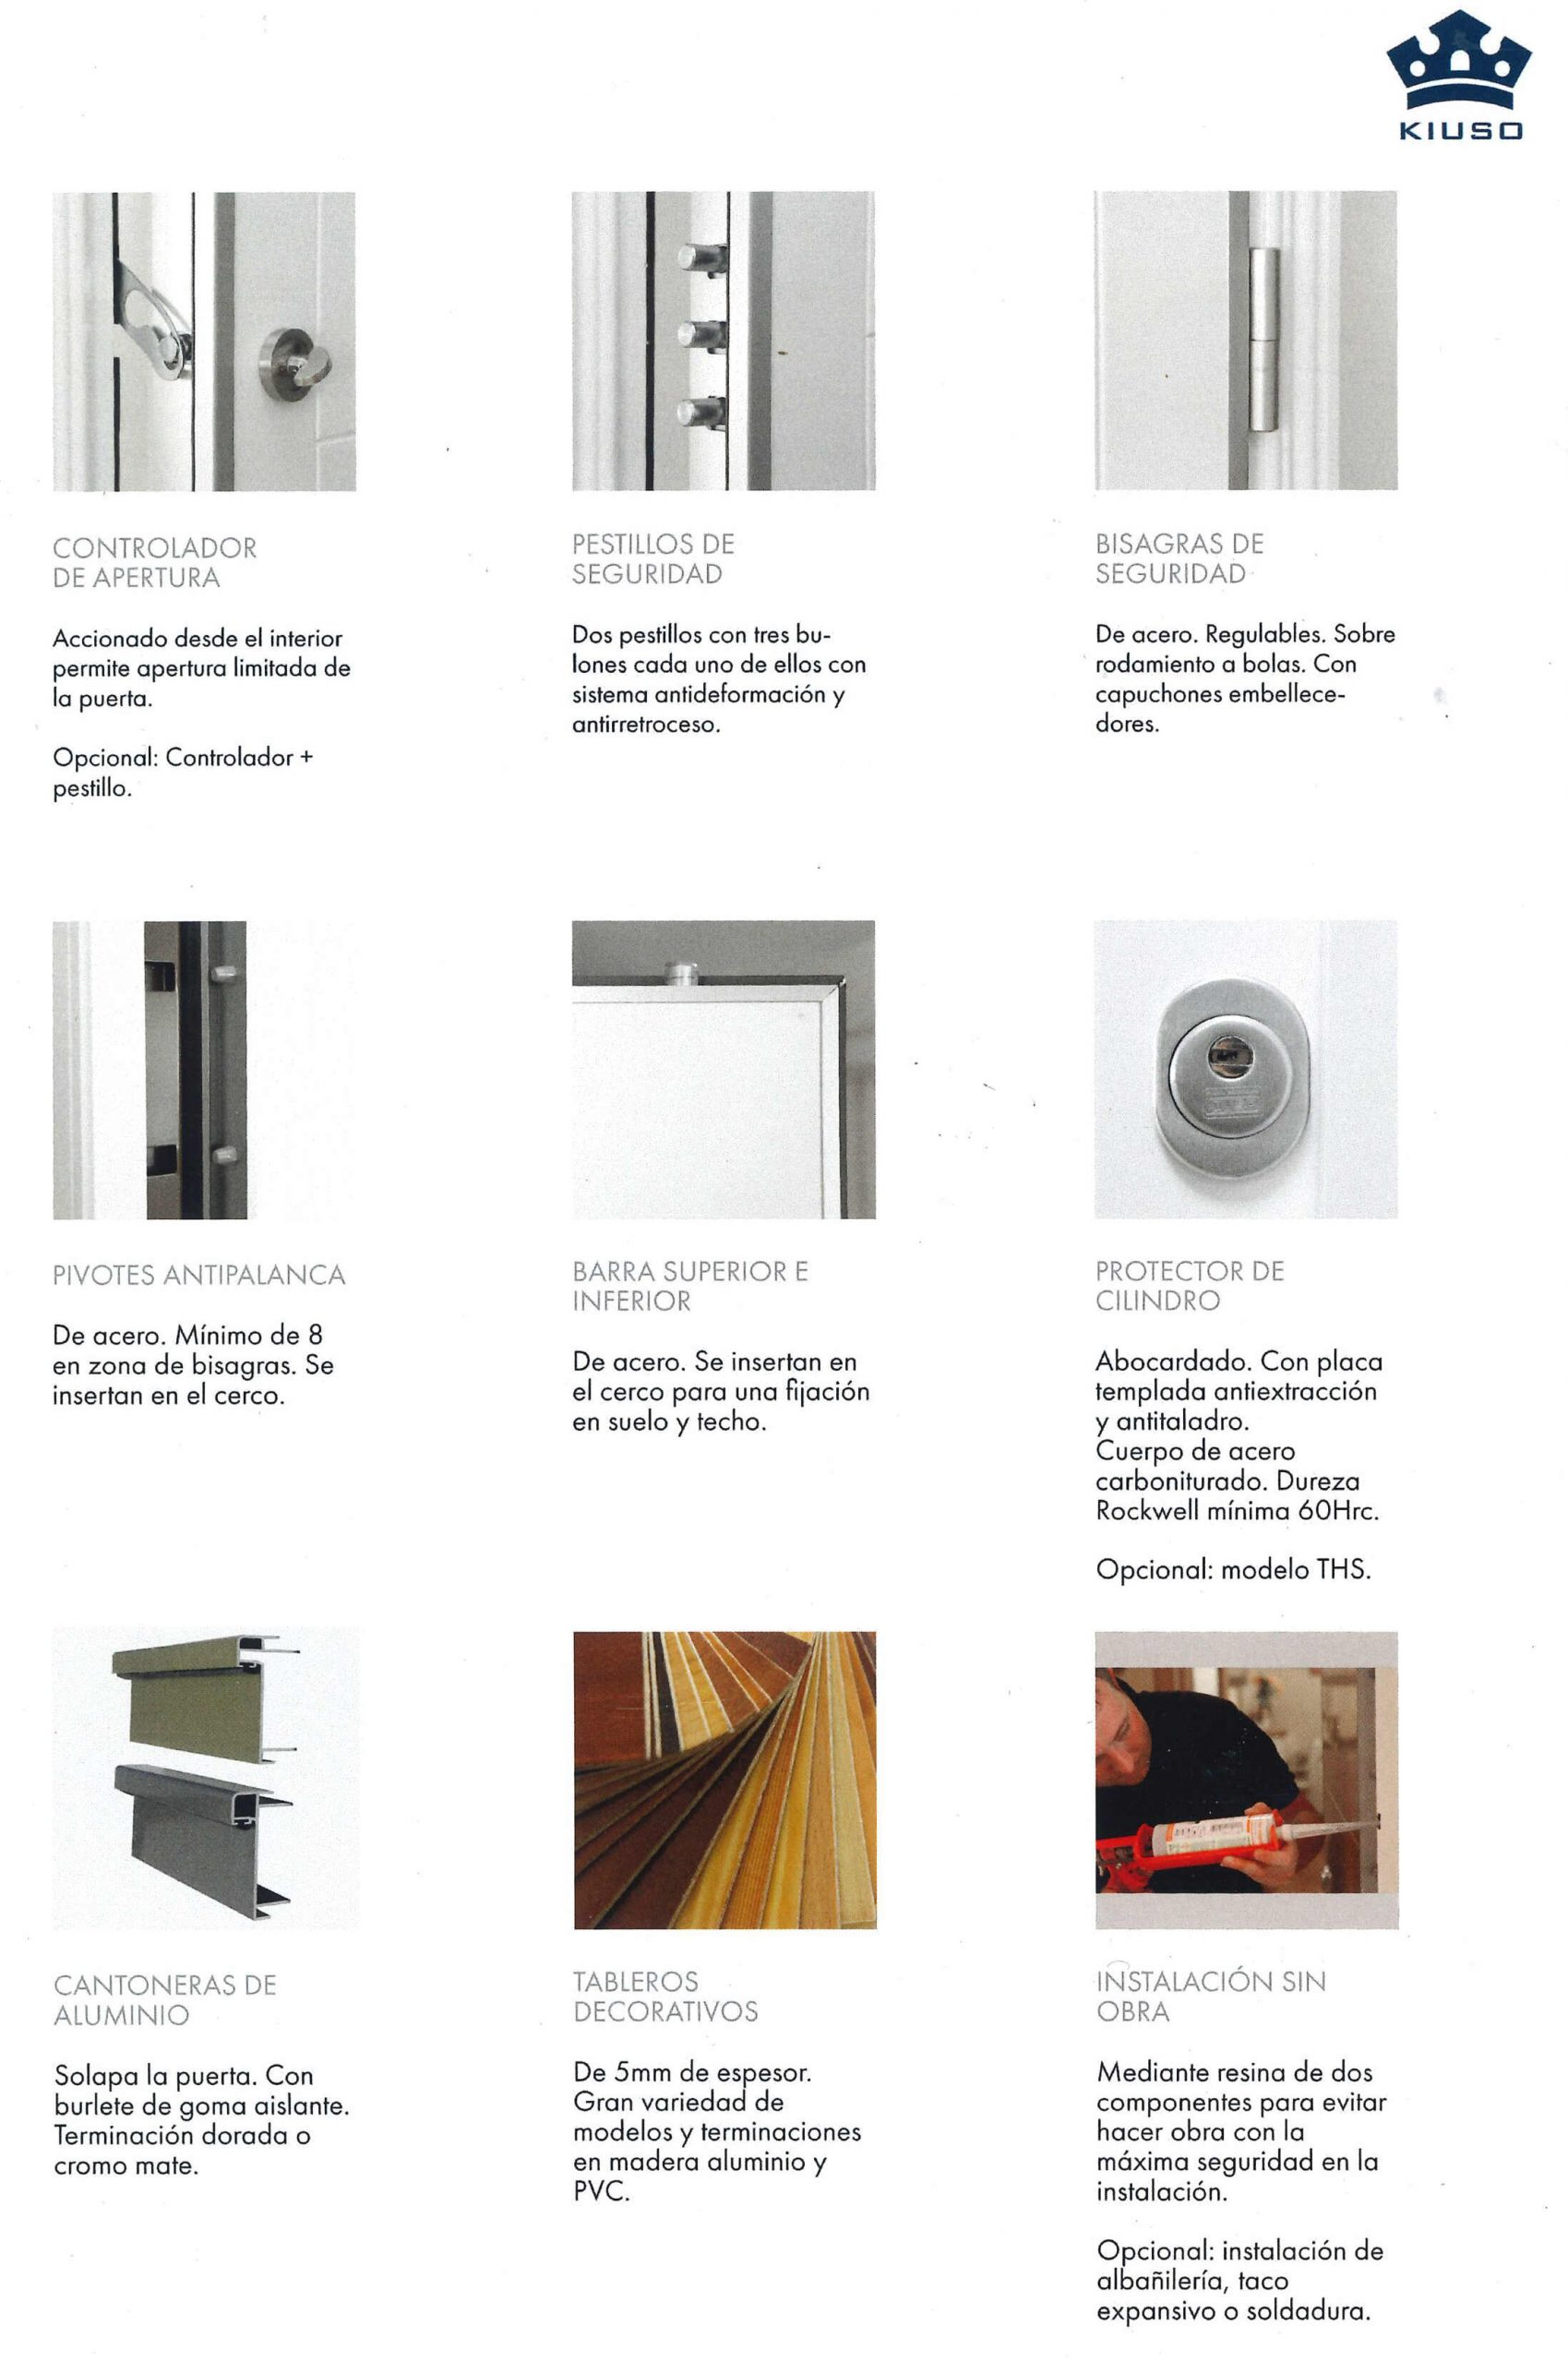 caracteristicas-puerta-kiuso-100